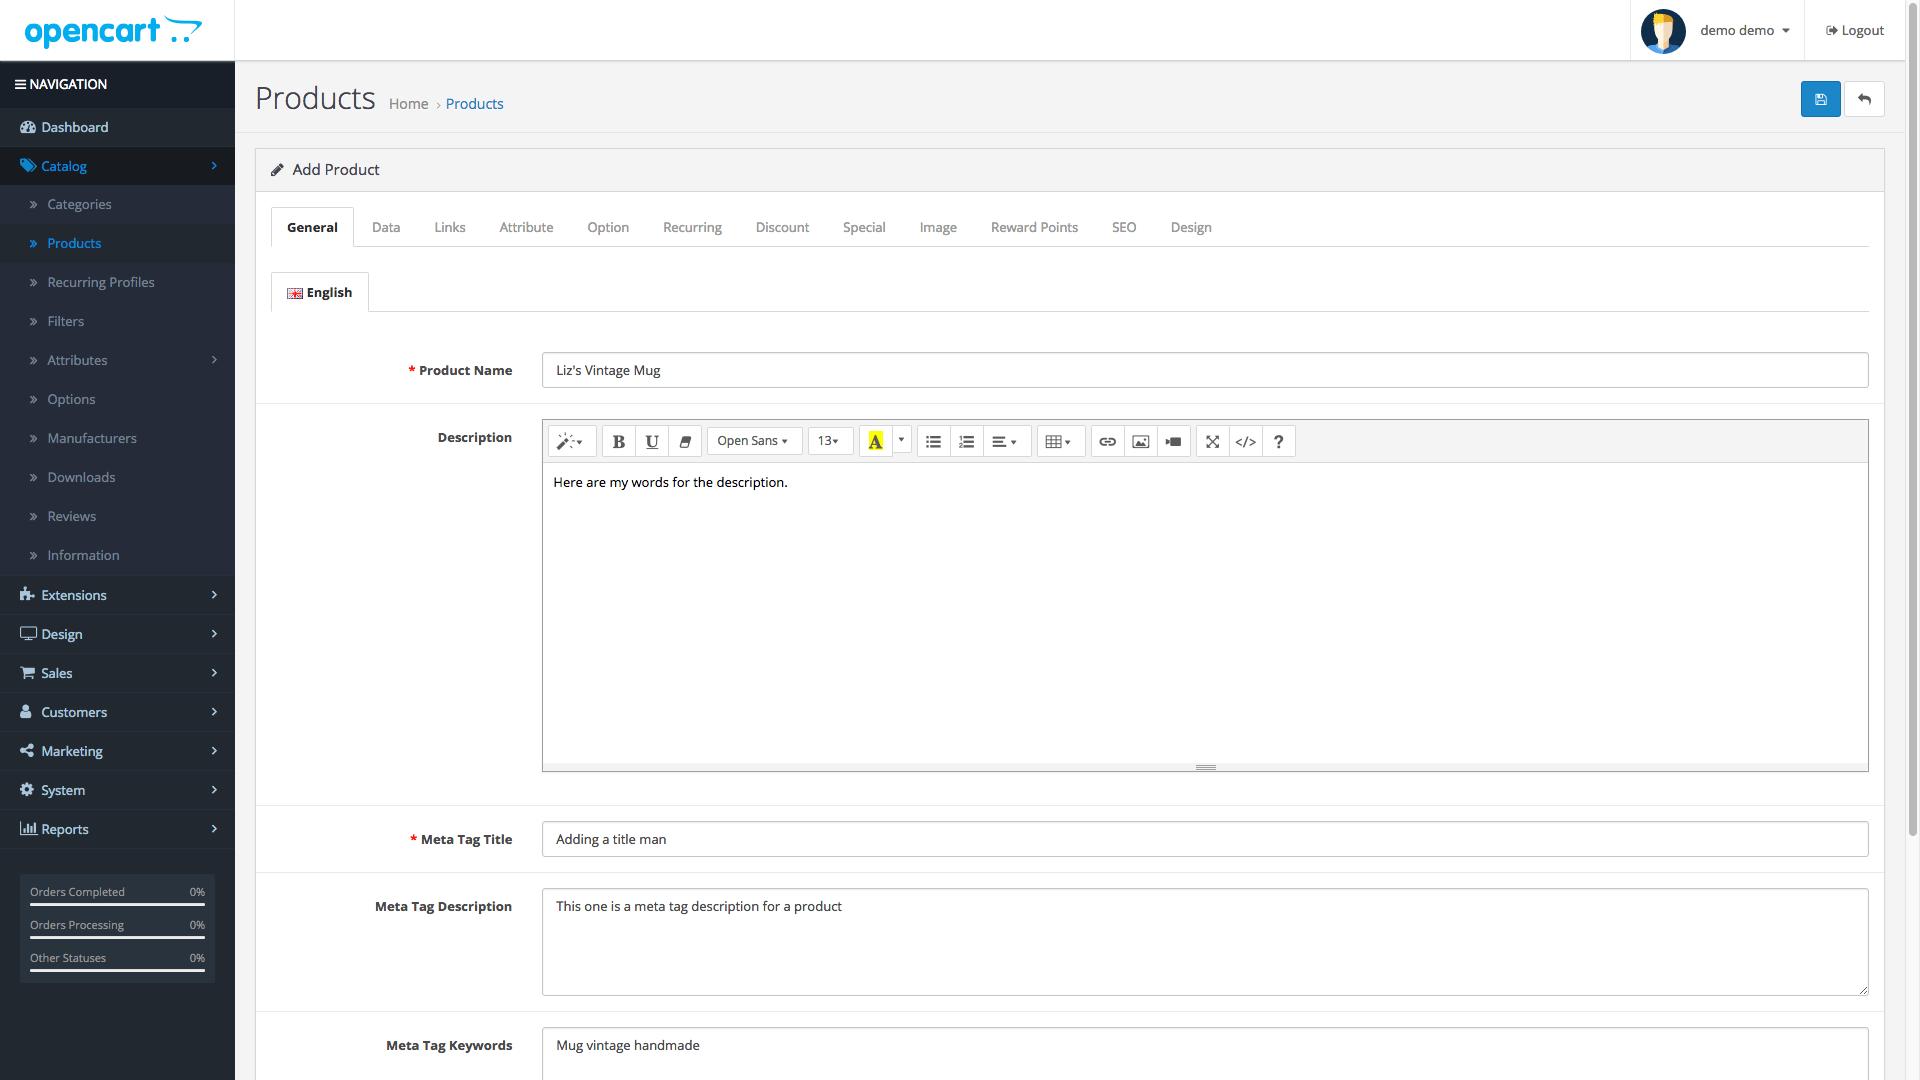 opencart add a product 518 | Website Builder |  - opencart add a product 518 - OpenCart Review